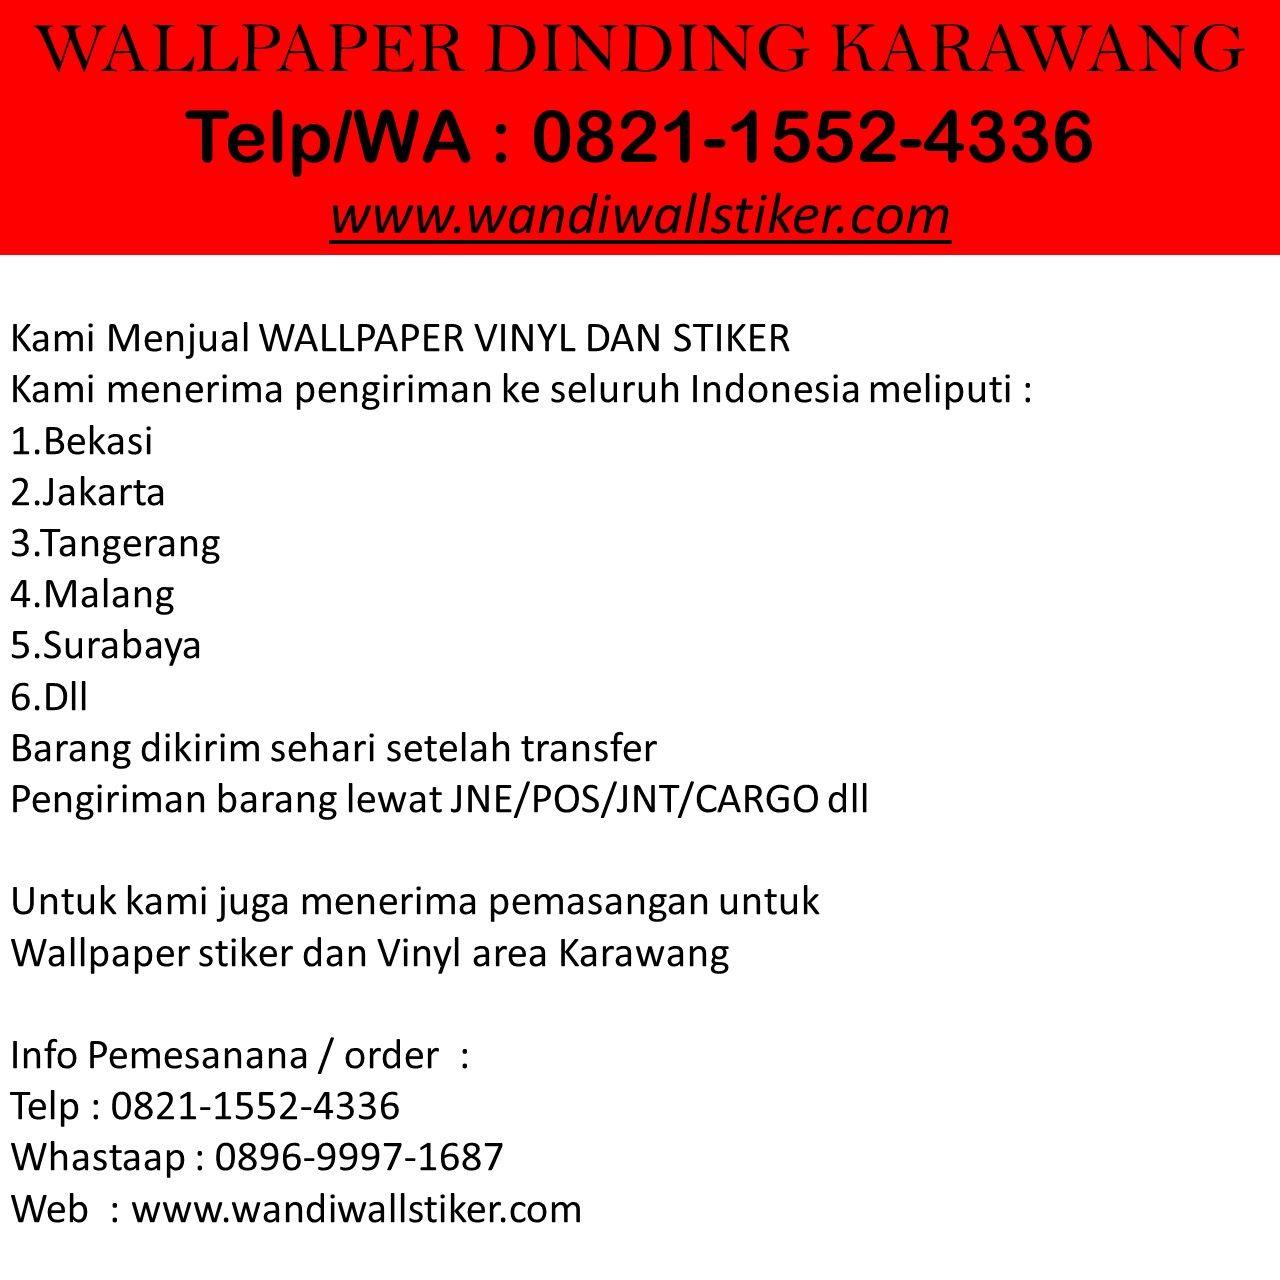 Ready Stock Telp Wa 0821 1552 4336 Simpati Agen Wallpaper Stiker Karawang Dinding Vinyl Kamar Anak